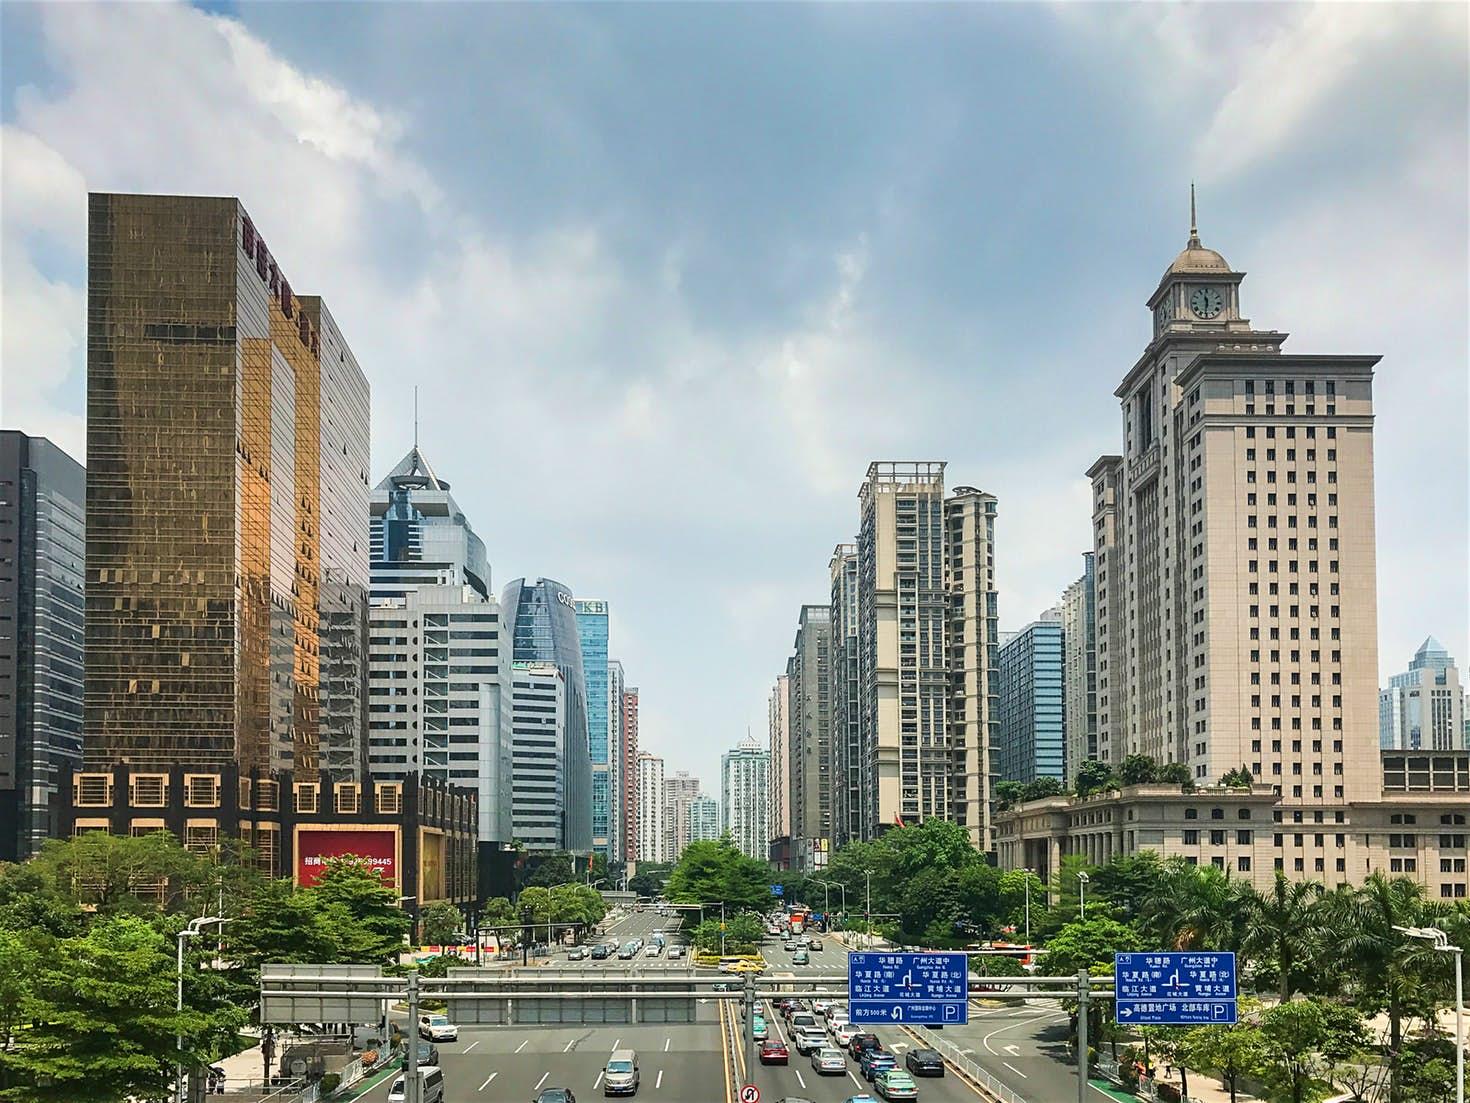 Washington DC to Guangzhou China $645 RT Airfares on 5* Qatar Airways (Limited Travel Sept-Oct 2019)